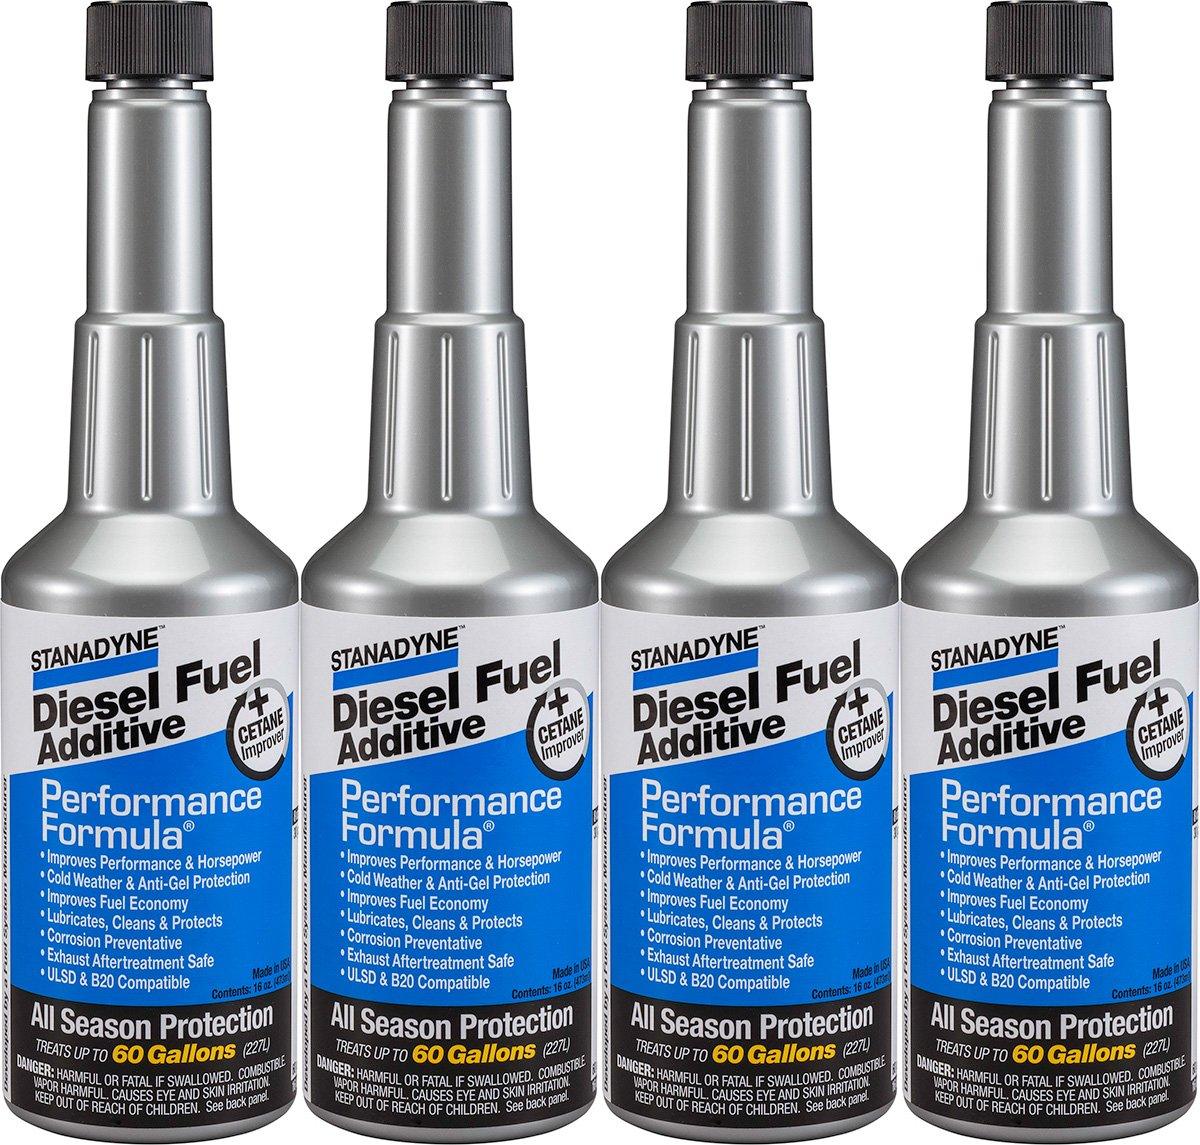 Stanadyne Performance Formula Diesel Fuel Additive - Pack of 4 Pint Bottles - Part # 38565